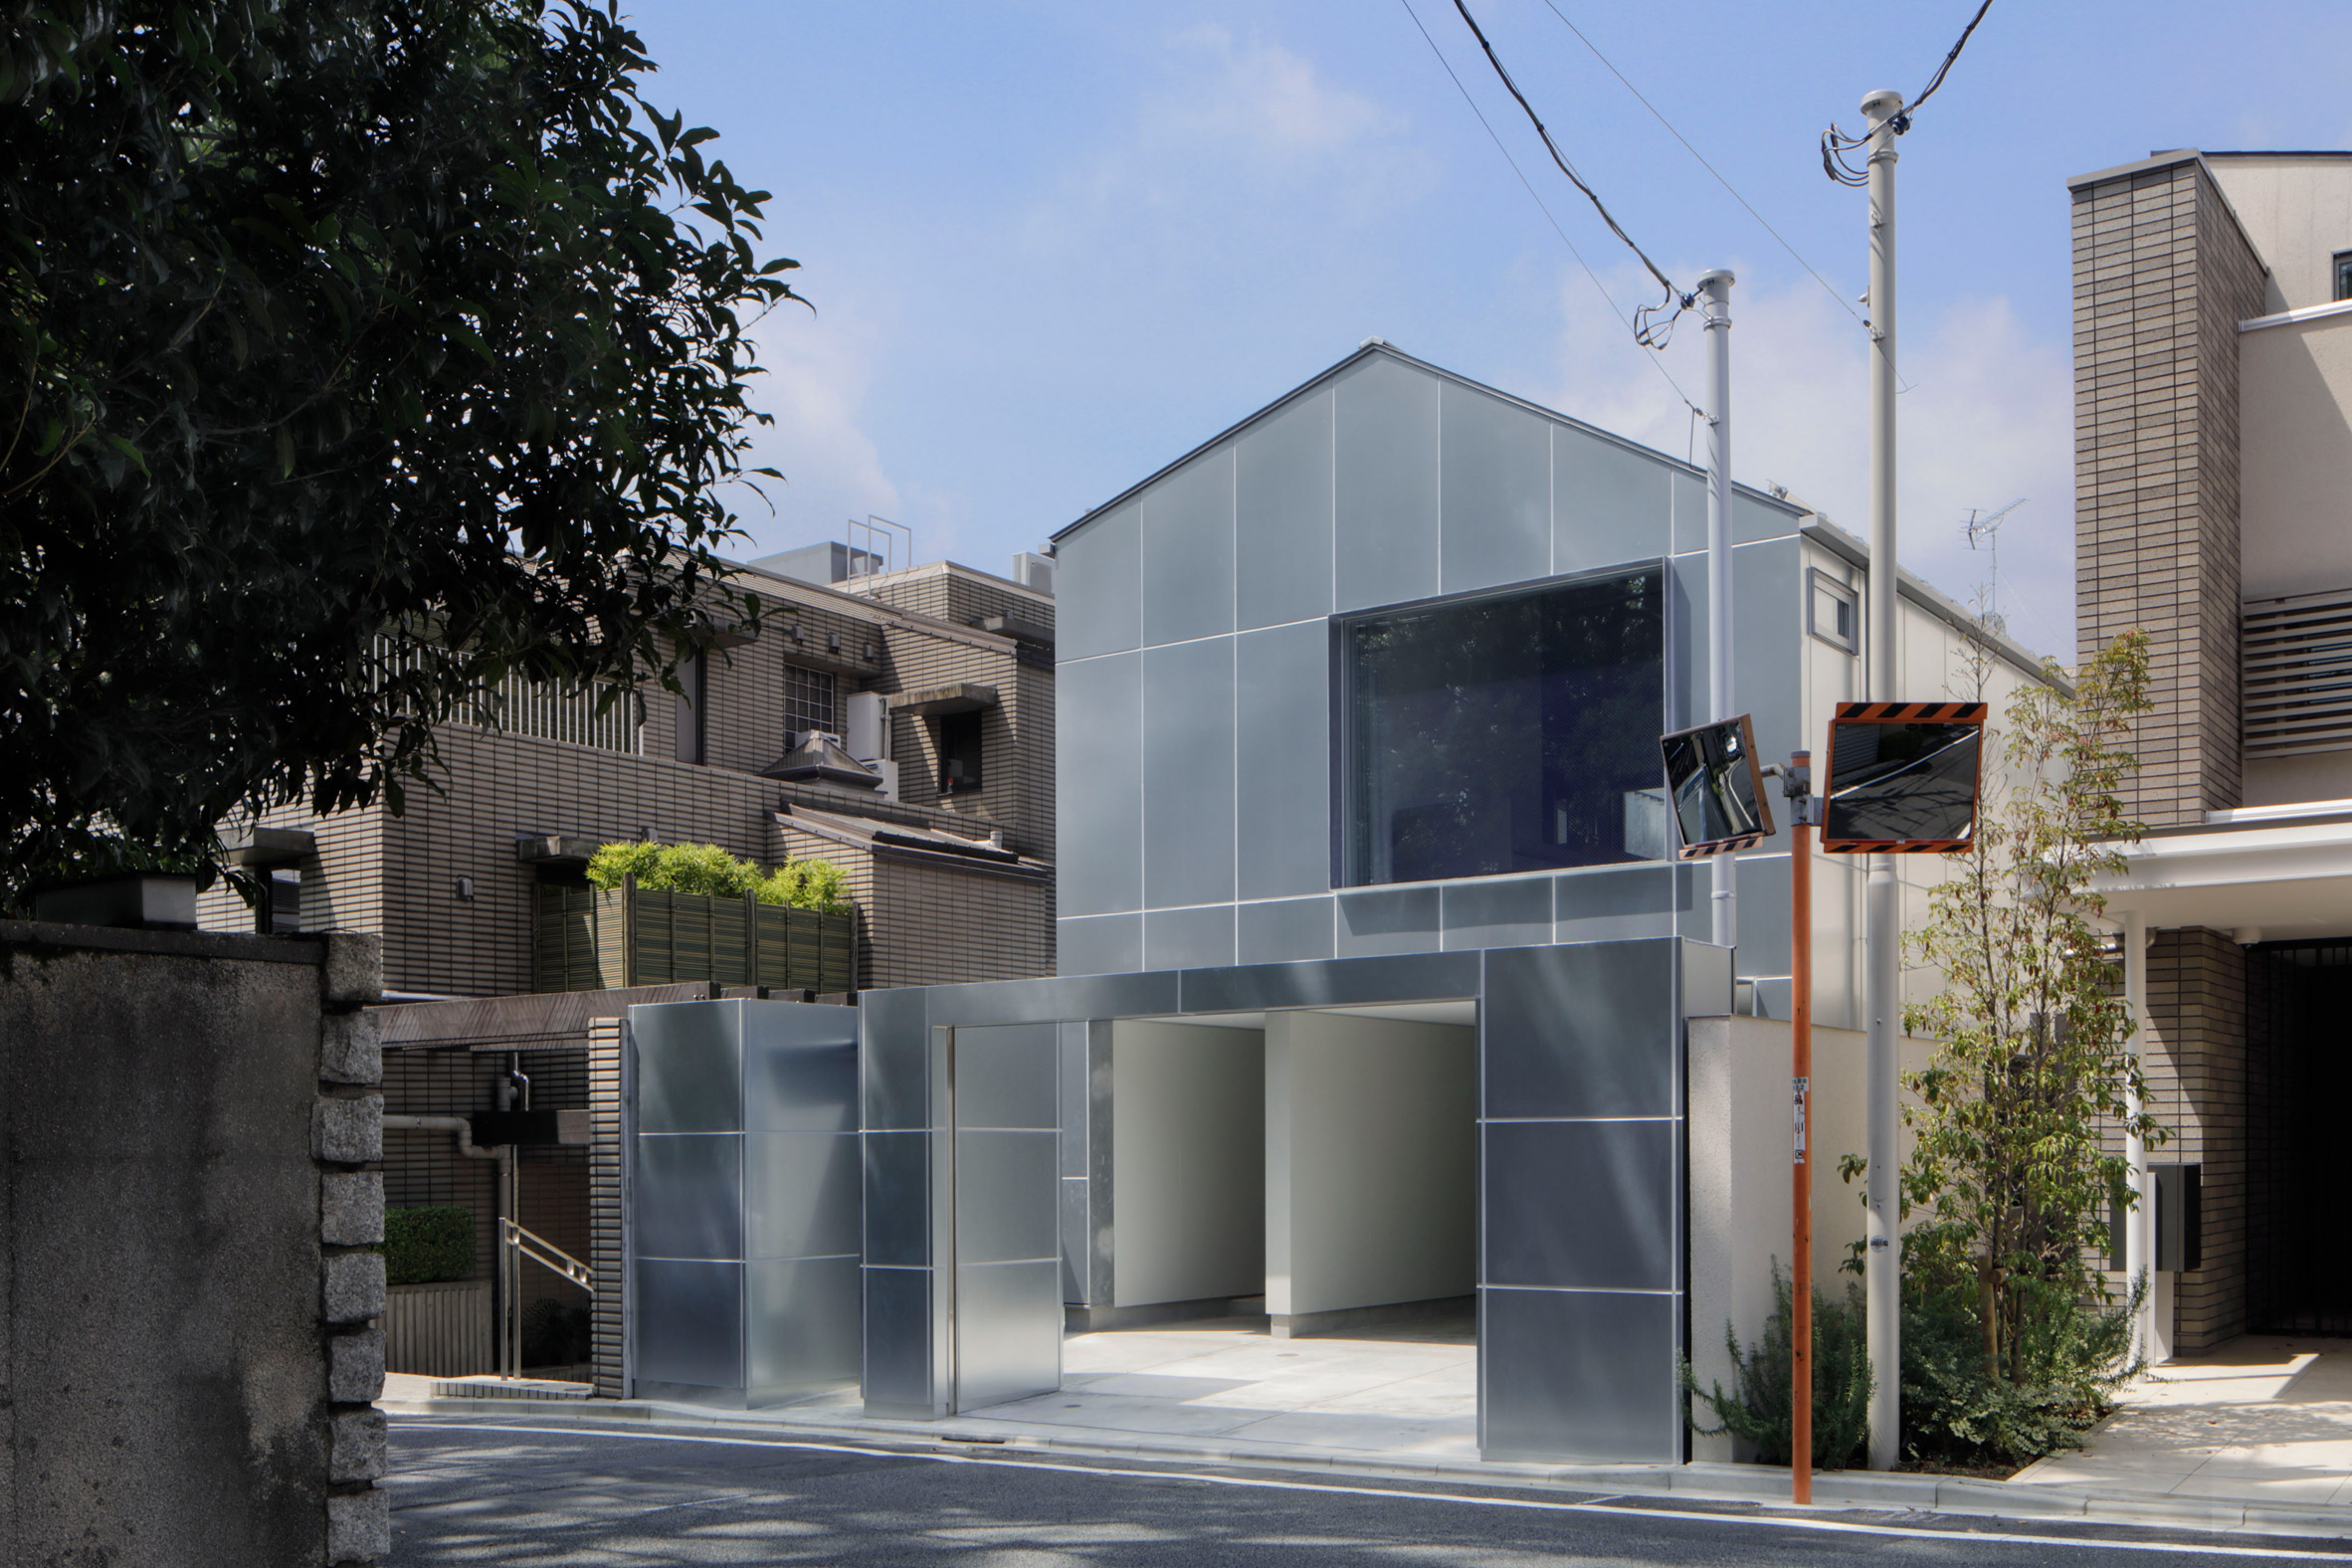 The steel-clad exterior